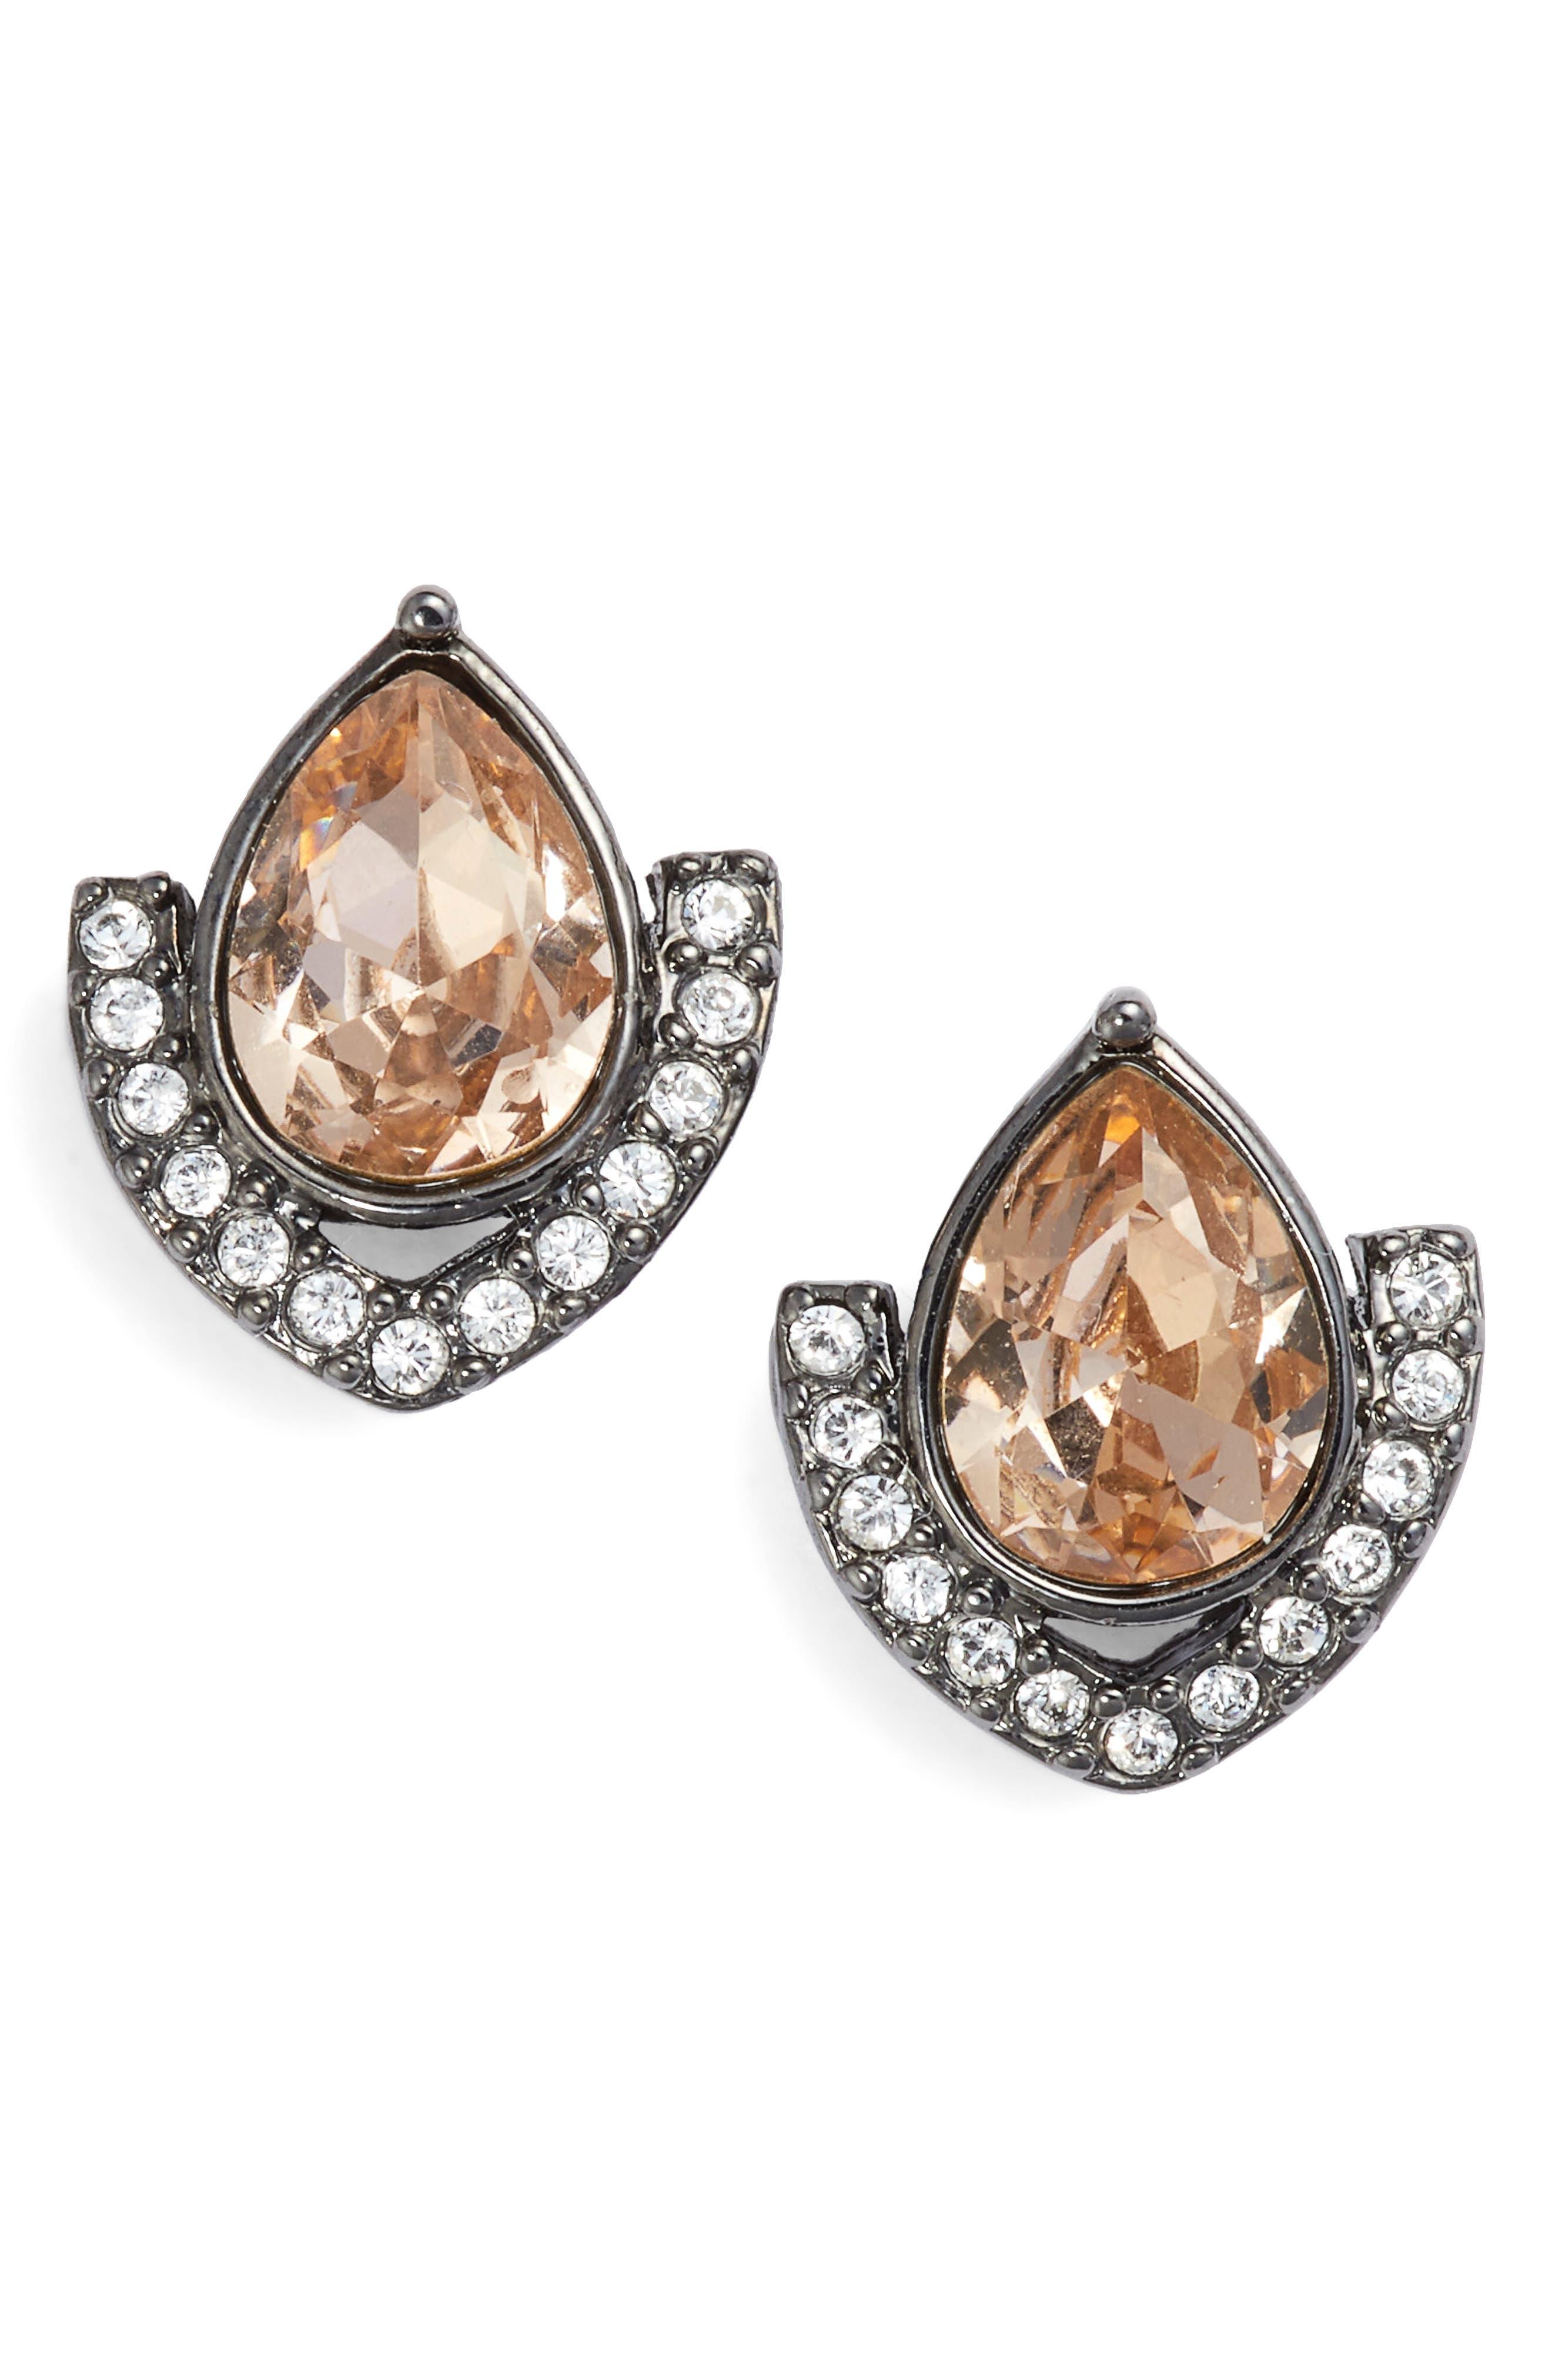 Main Image - Jenny Packham Crystal Stud Earrings